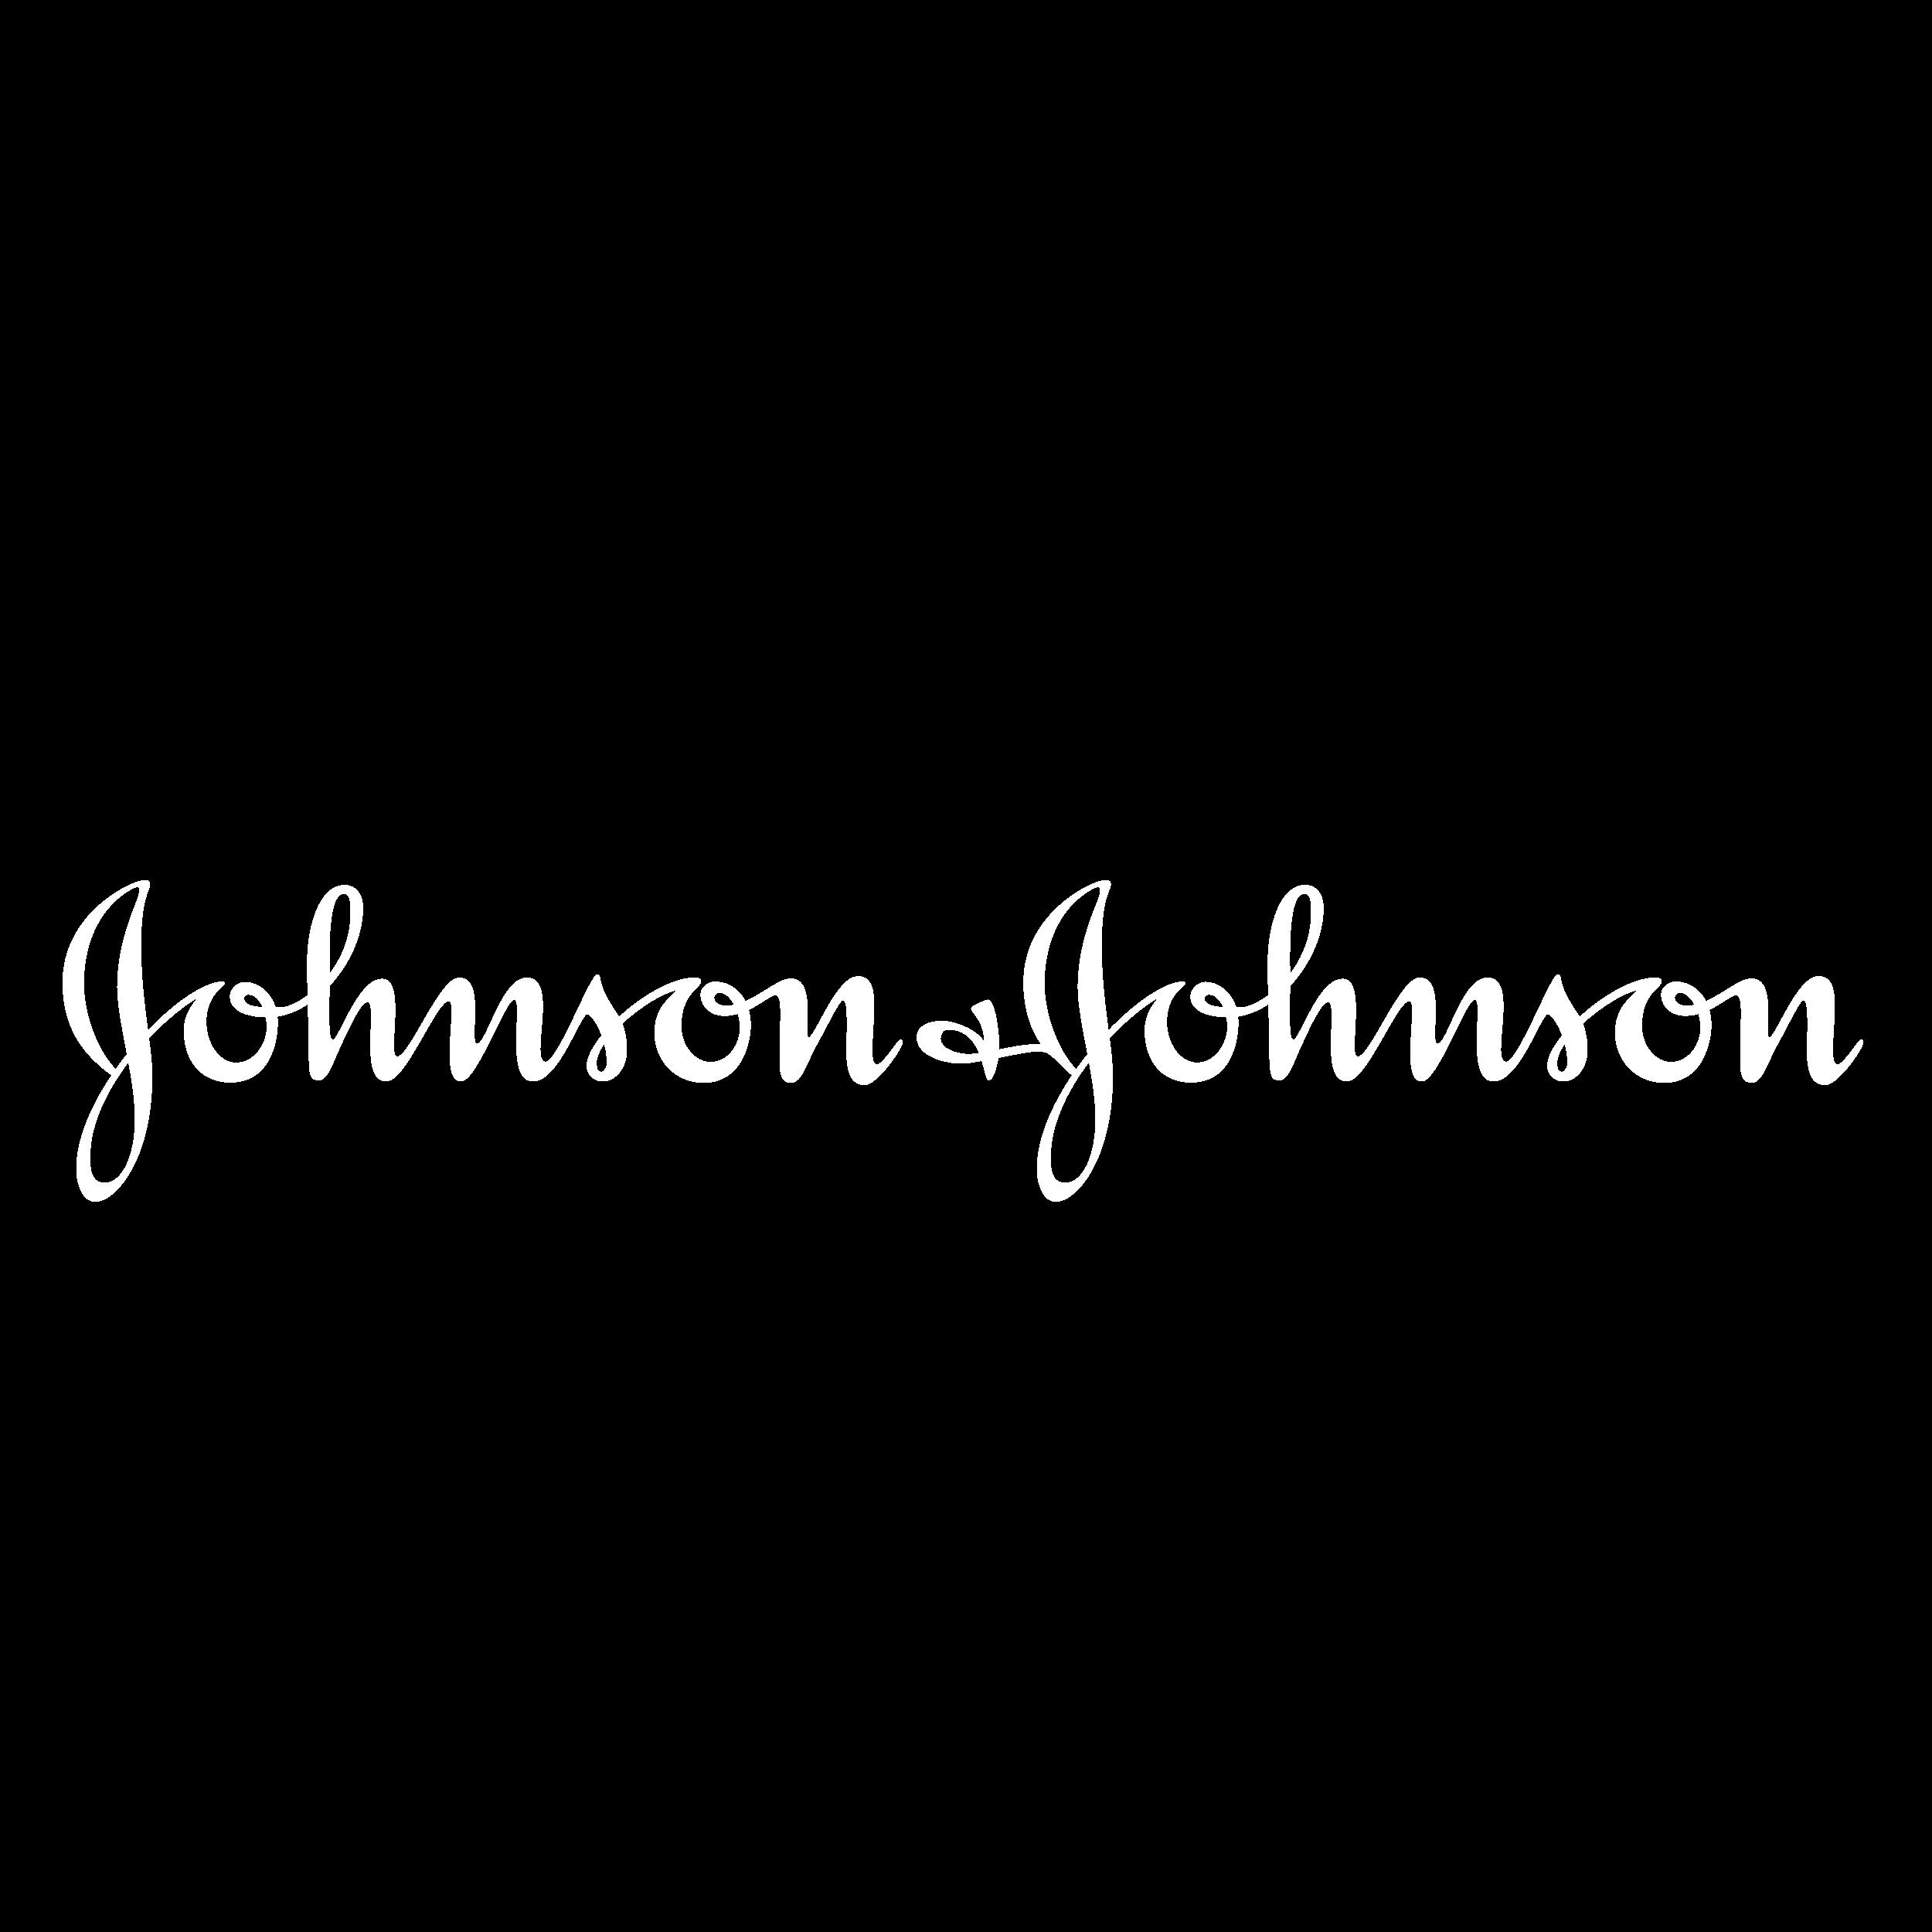 johnson-johnson-logo-black-and-white